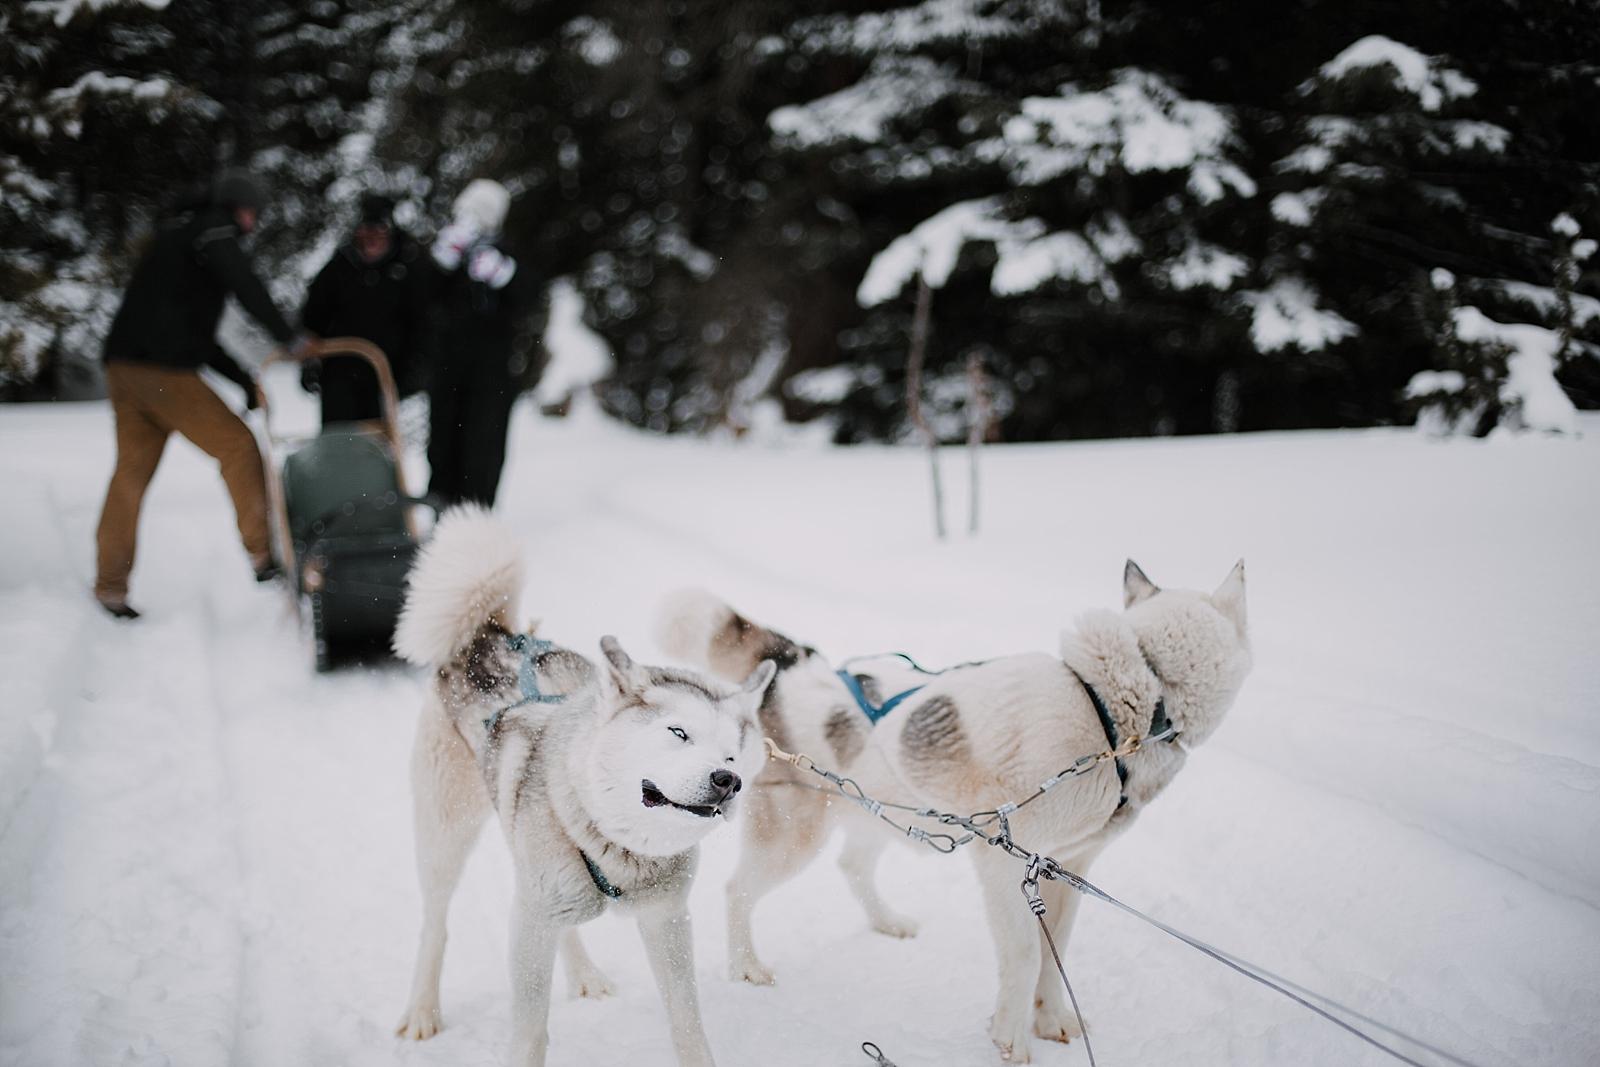 husky shaking off snow, leadville elopement photographer, leadville wedding photographer, breckenridge elopement photographer, breckenridge wedding photographer, sapphire point photographer